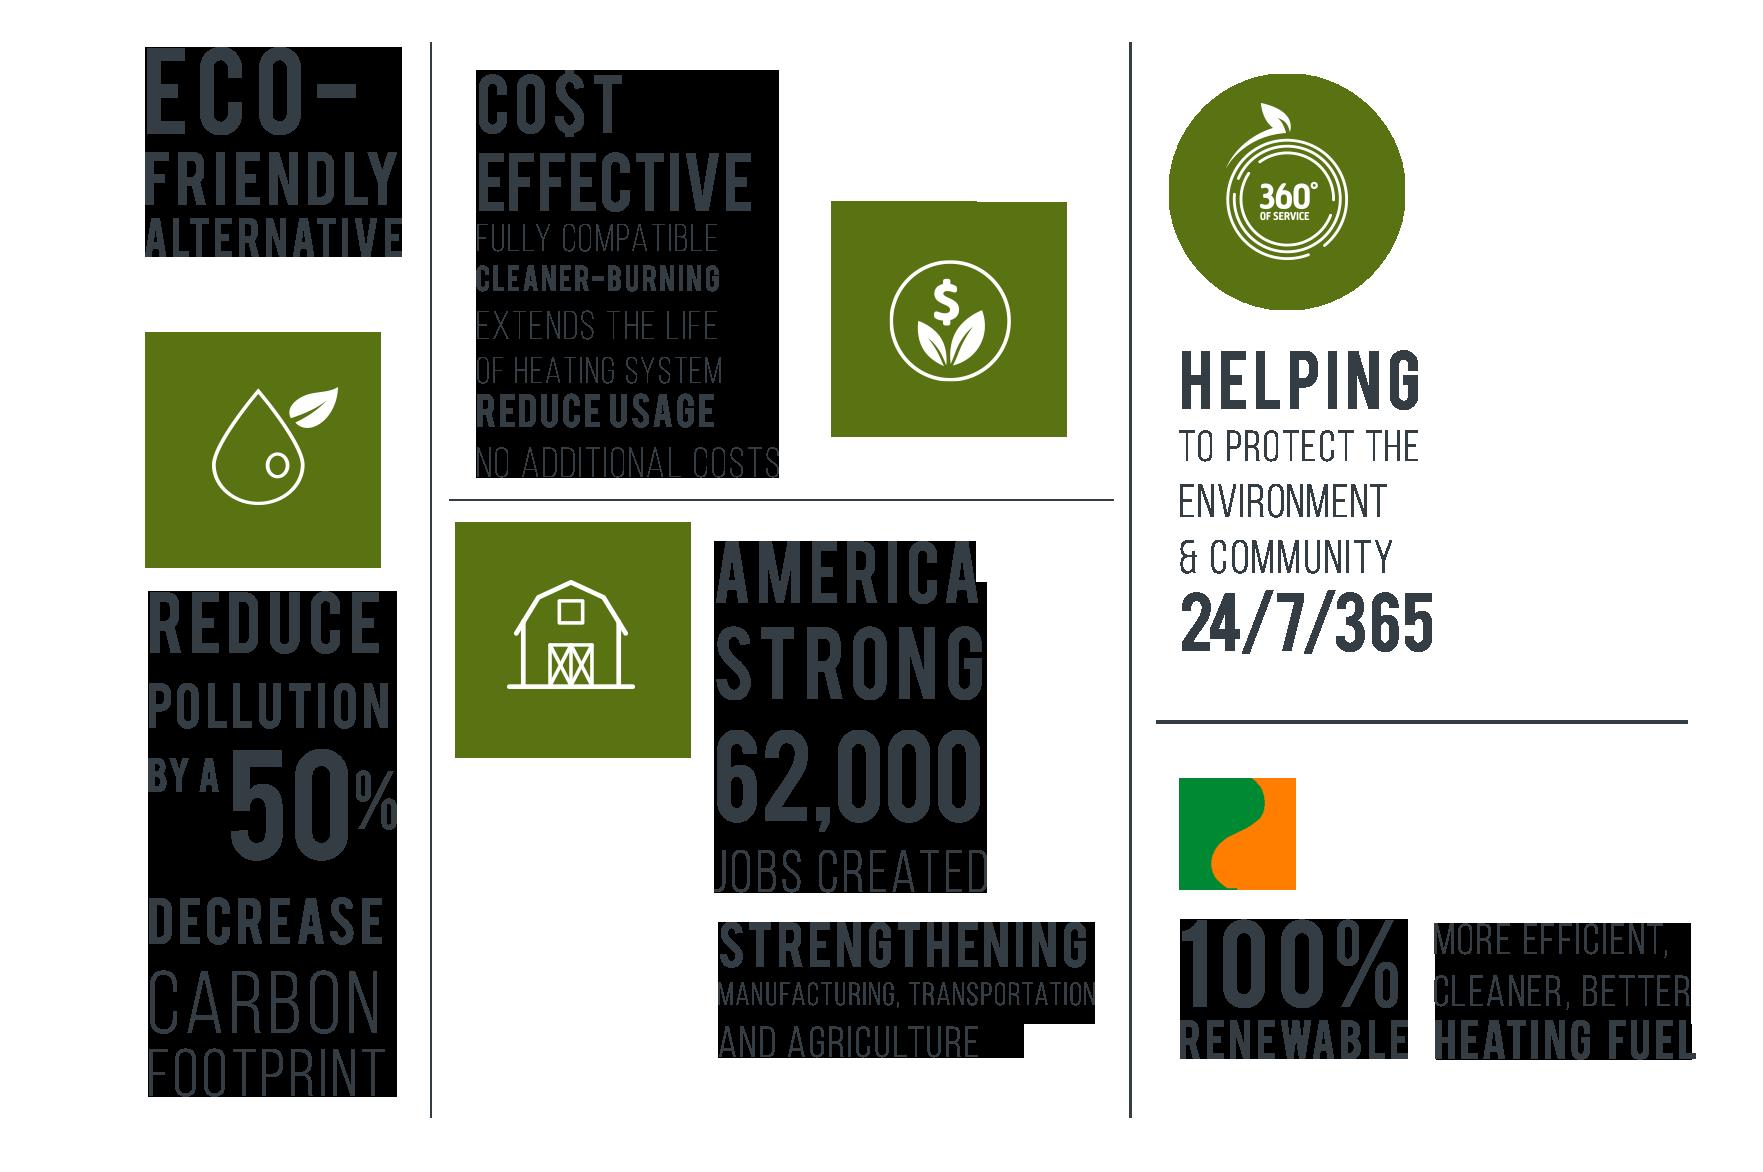 Bioheat Infographic